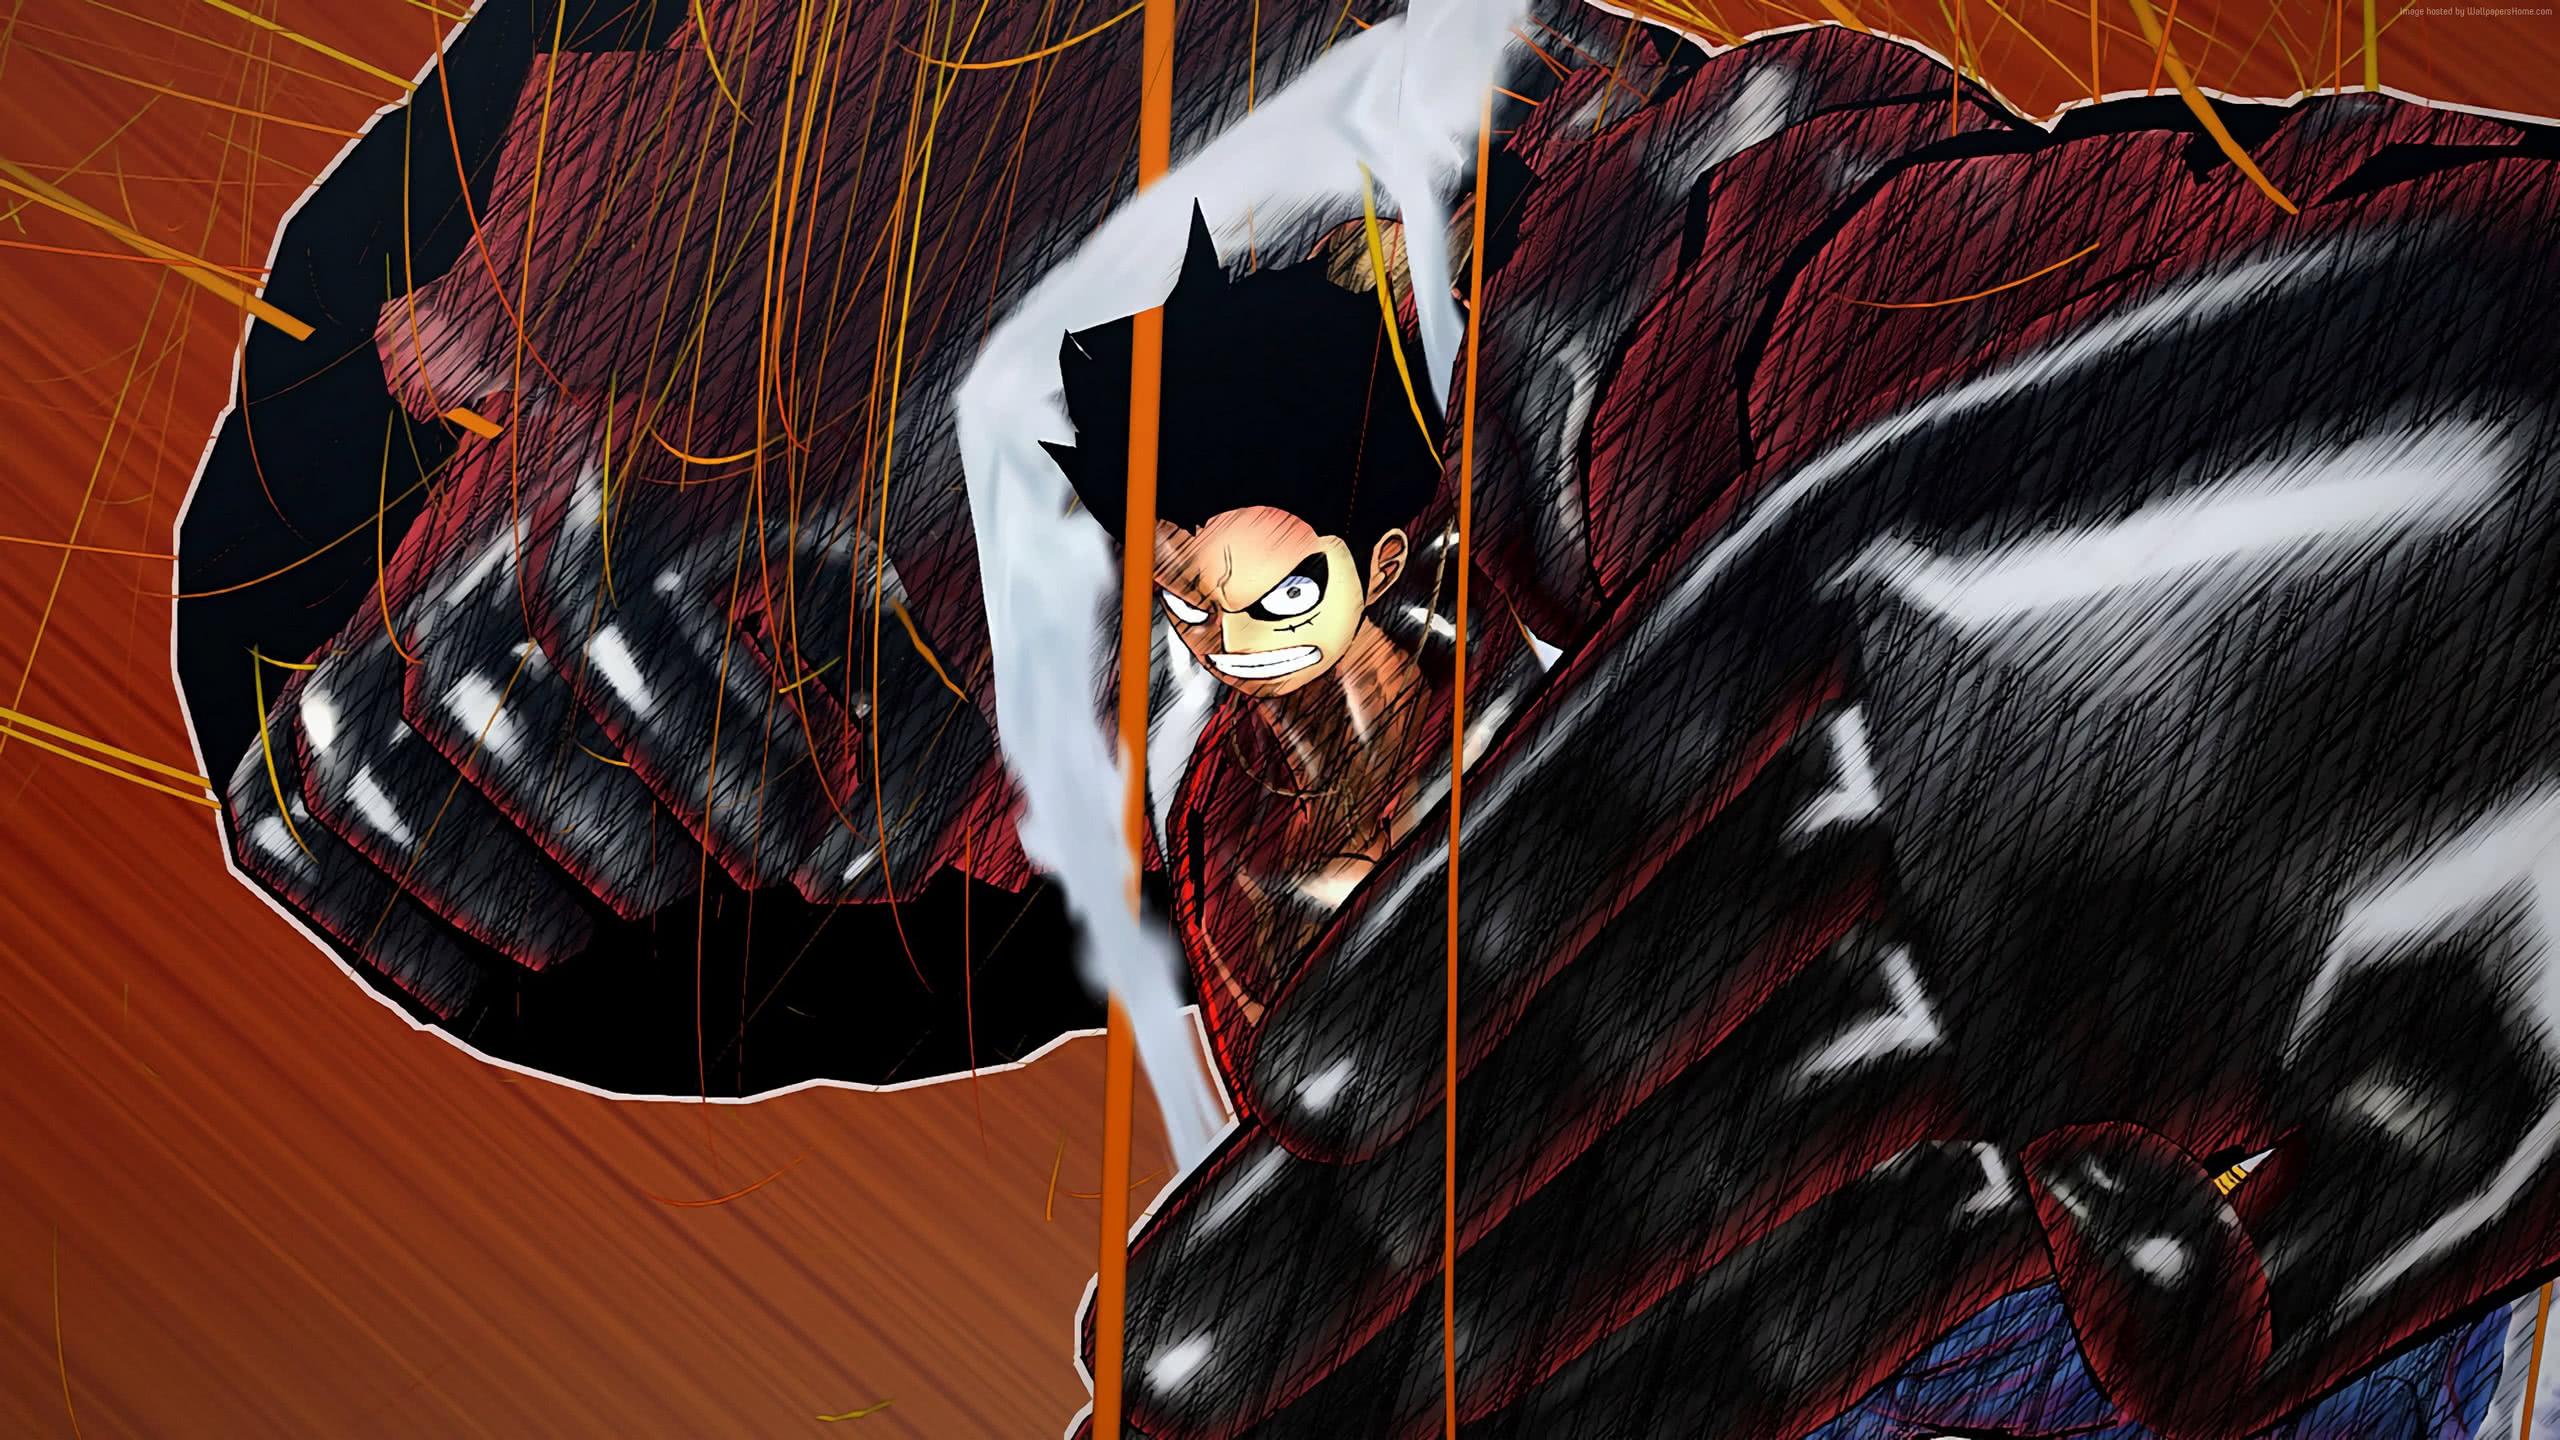 One Piece Burning Blood Monkey D Luffy Wqhd 1440p Wallpaper Pixelz